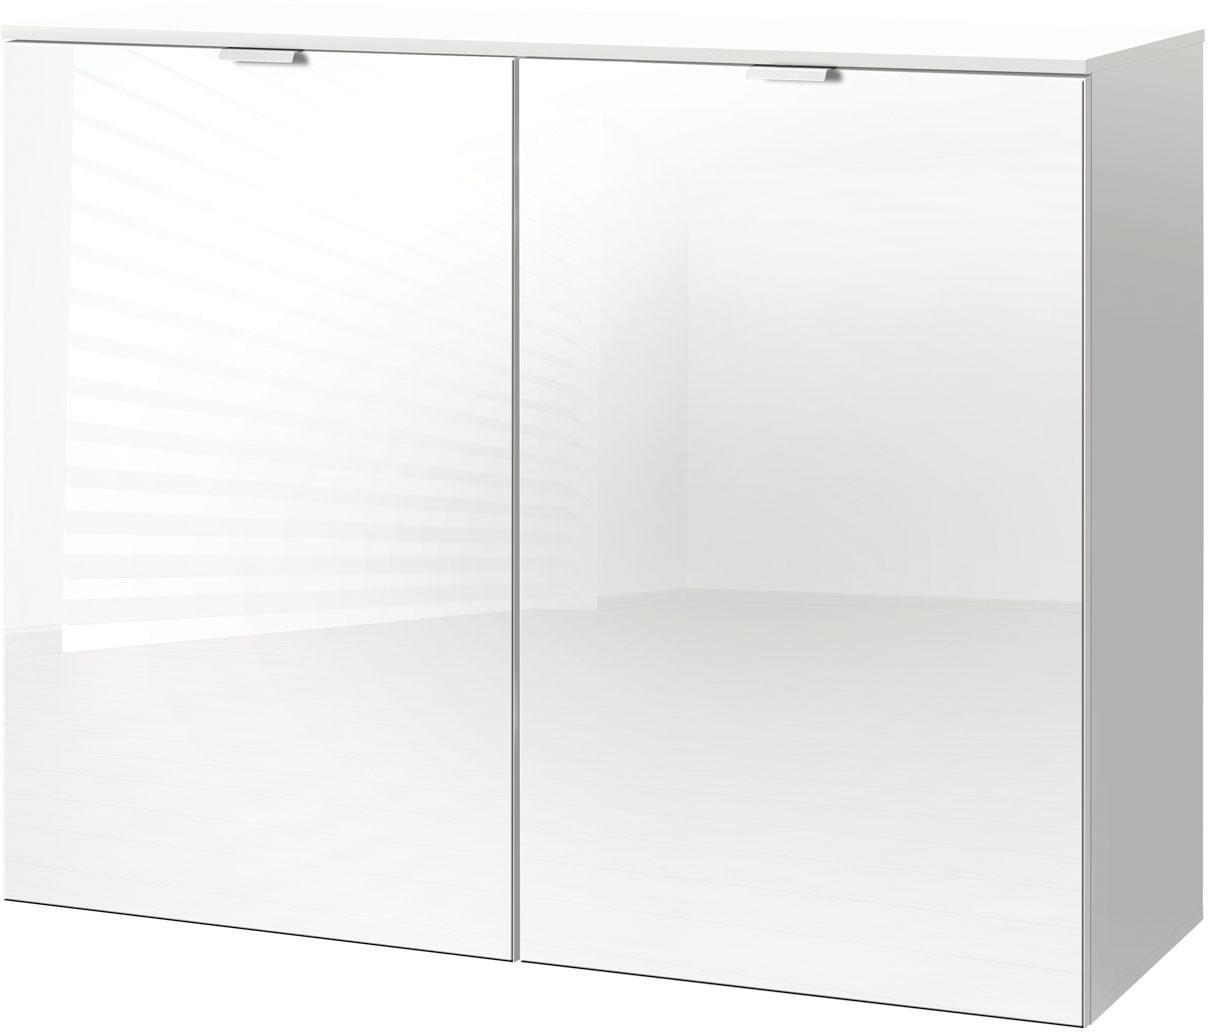 Express Solutions Kommode Breite 100 cm